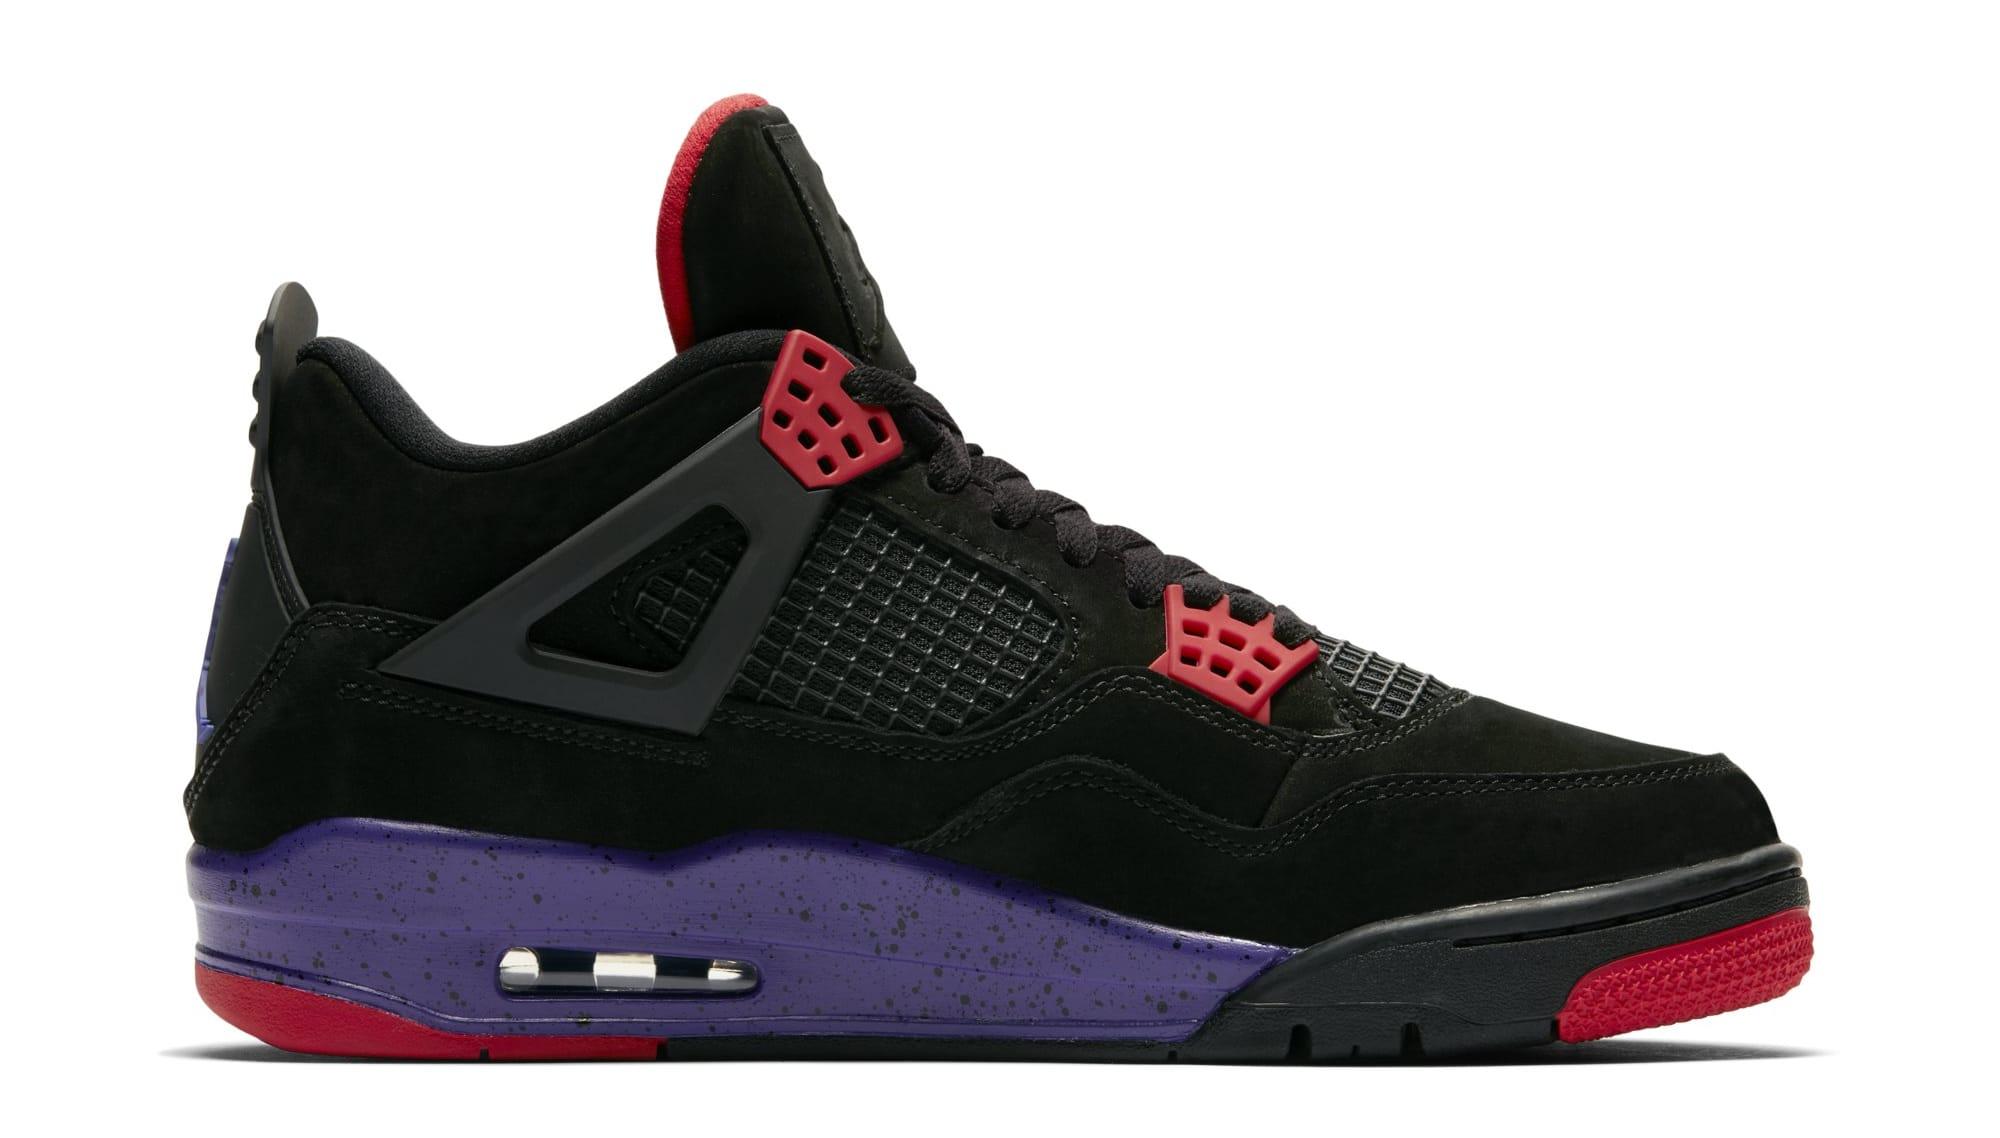 e3c791accfa Air Jordan 4 Retro NRG 'Black/University Red/Court Purple ' AQ3816-056  Release Date | Sole Collector